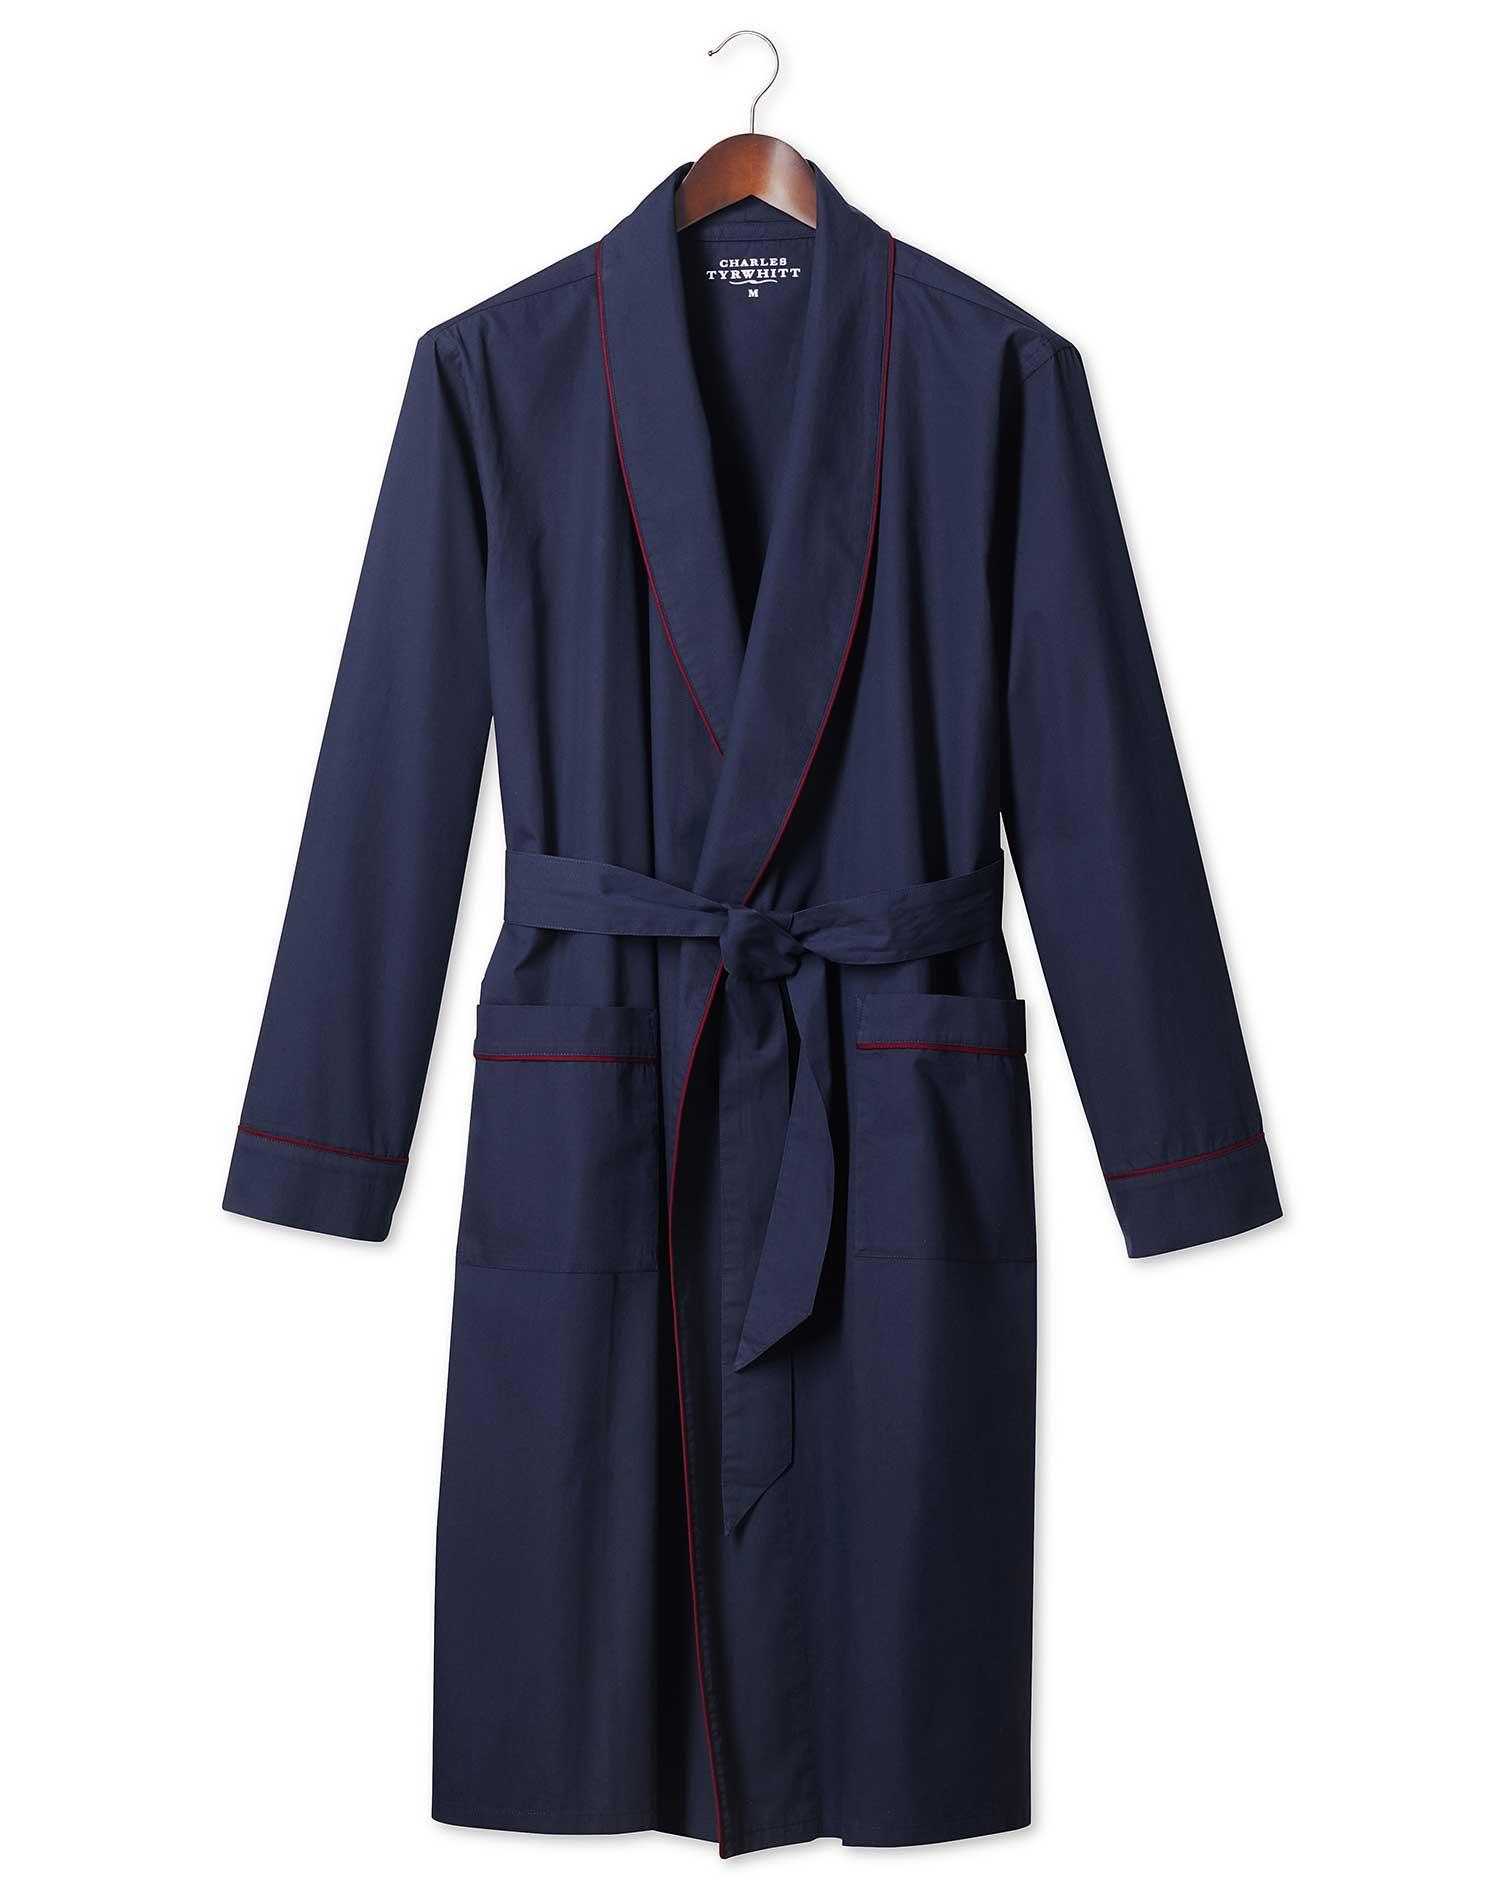 Plain Navy Lightweight Robe Size Medium by Charles Tyrwhitt